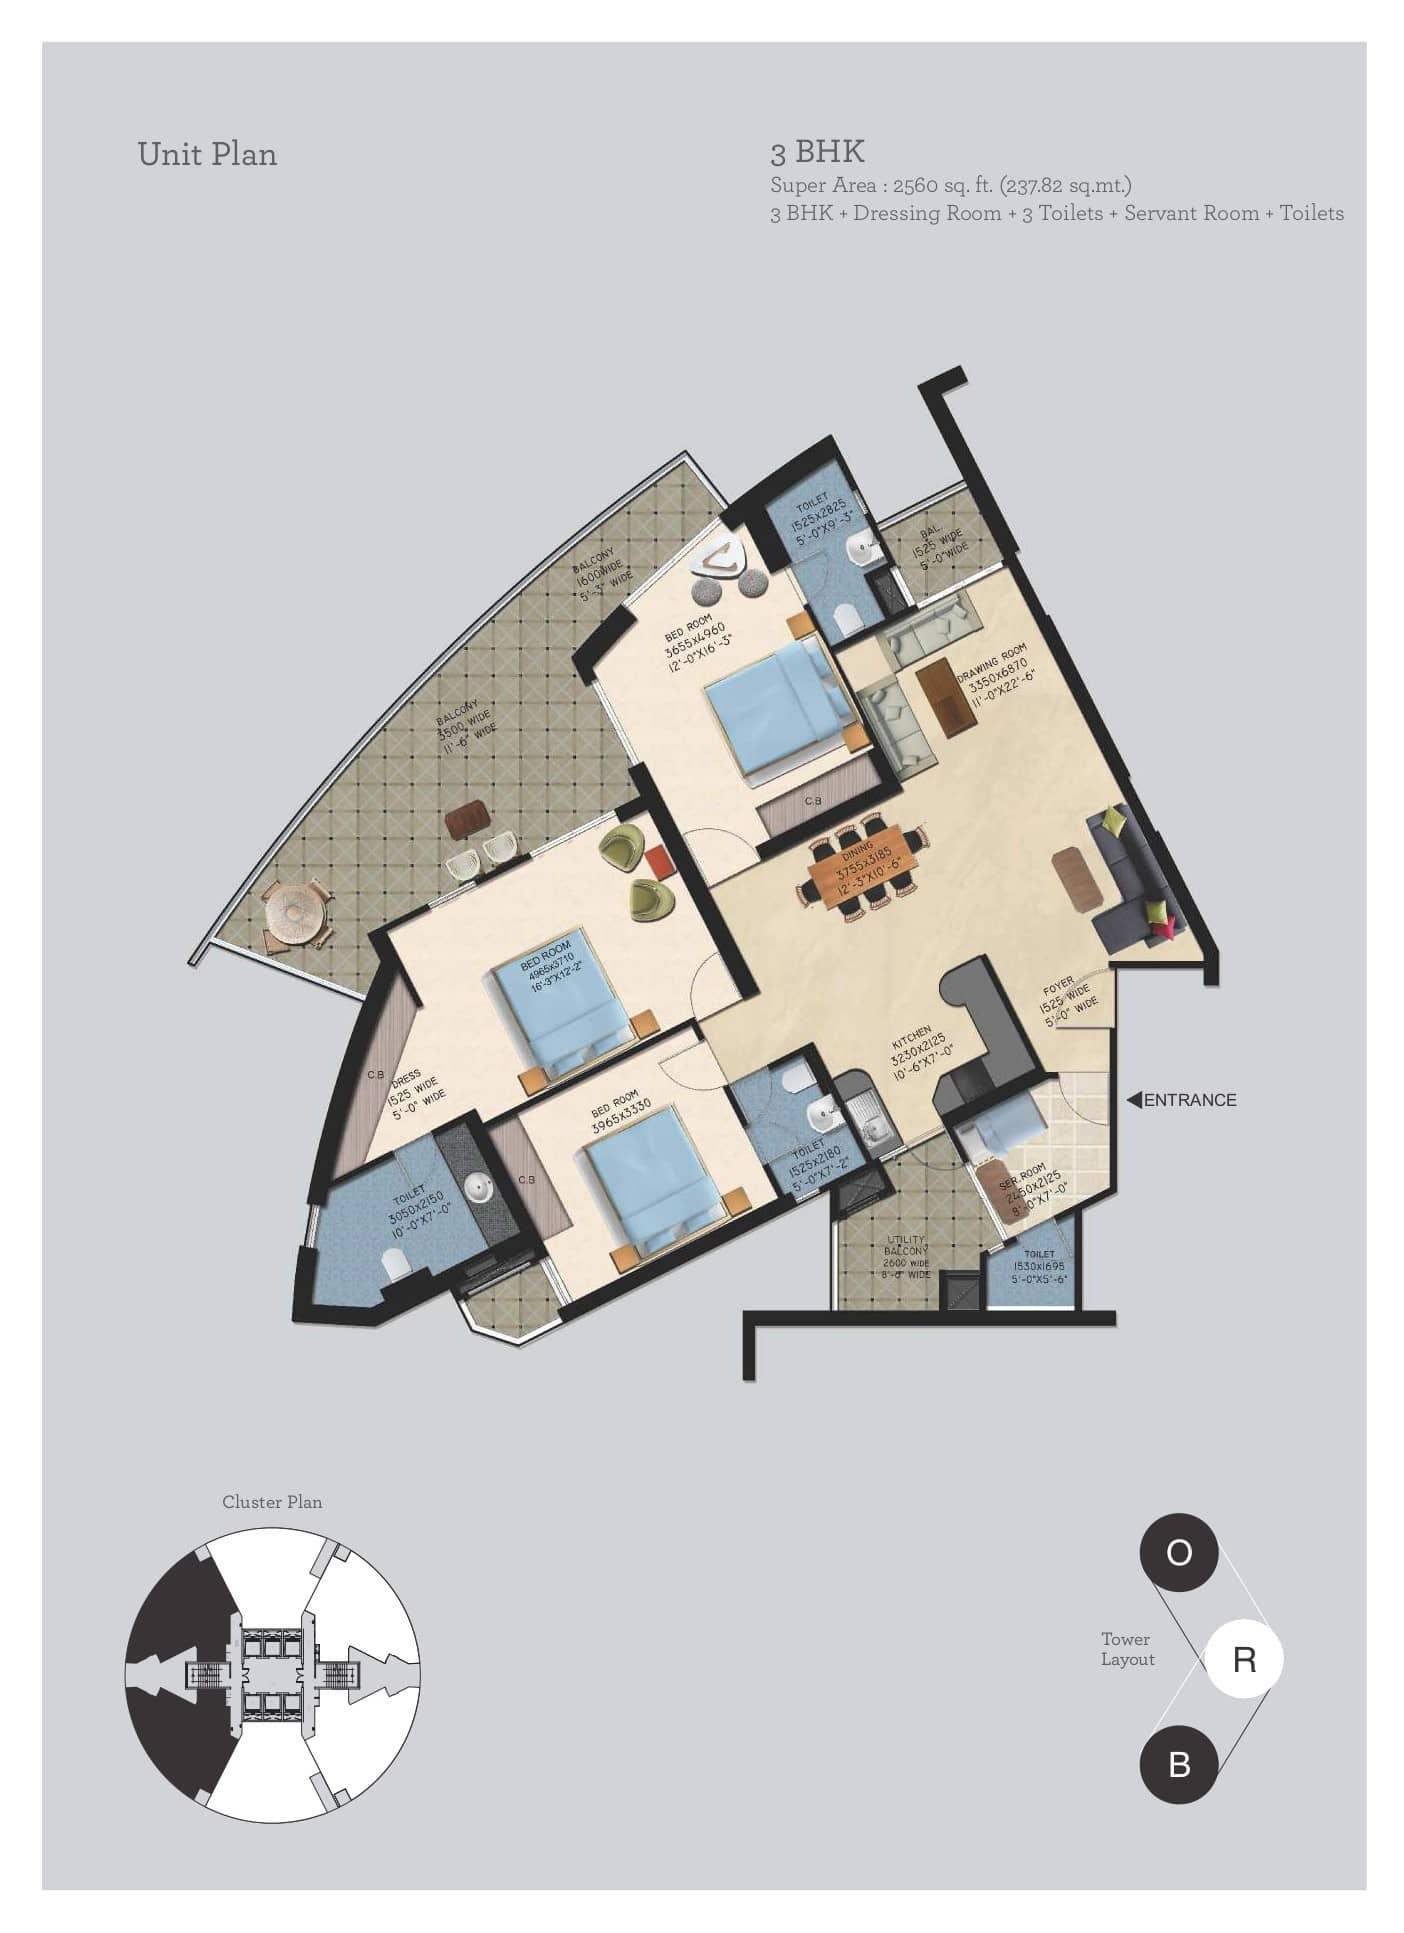 supertech-orb-homes-2560-sq-ft